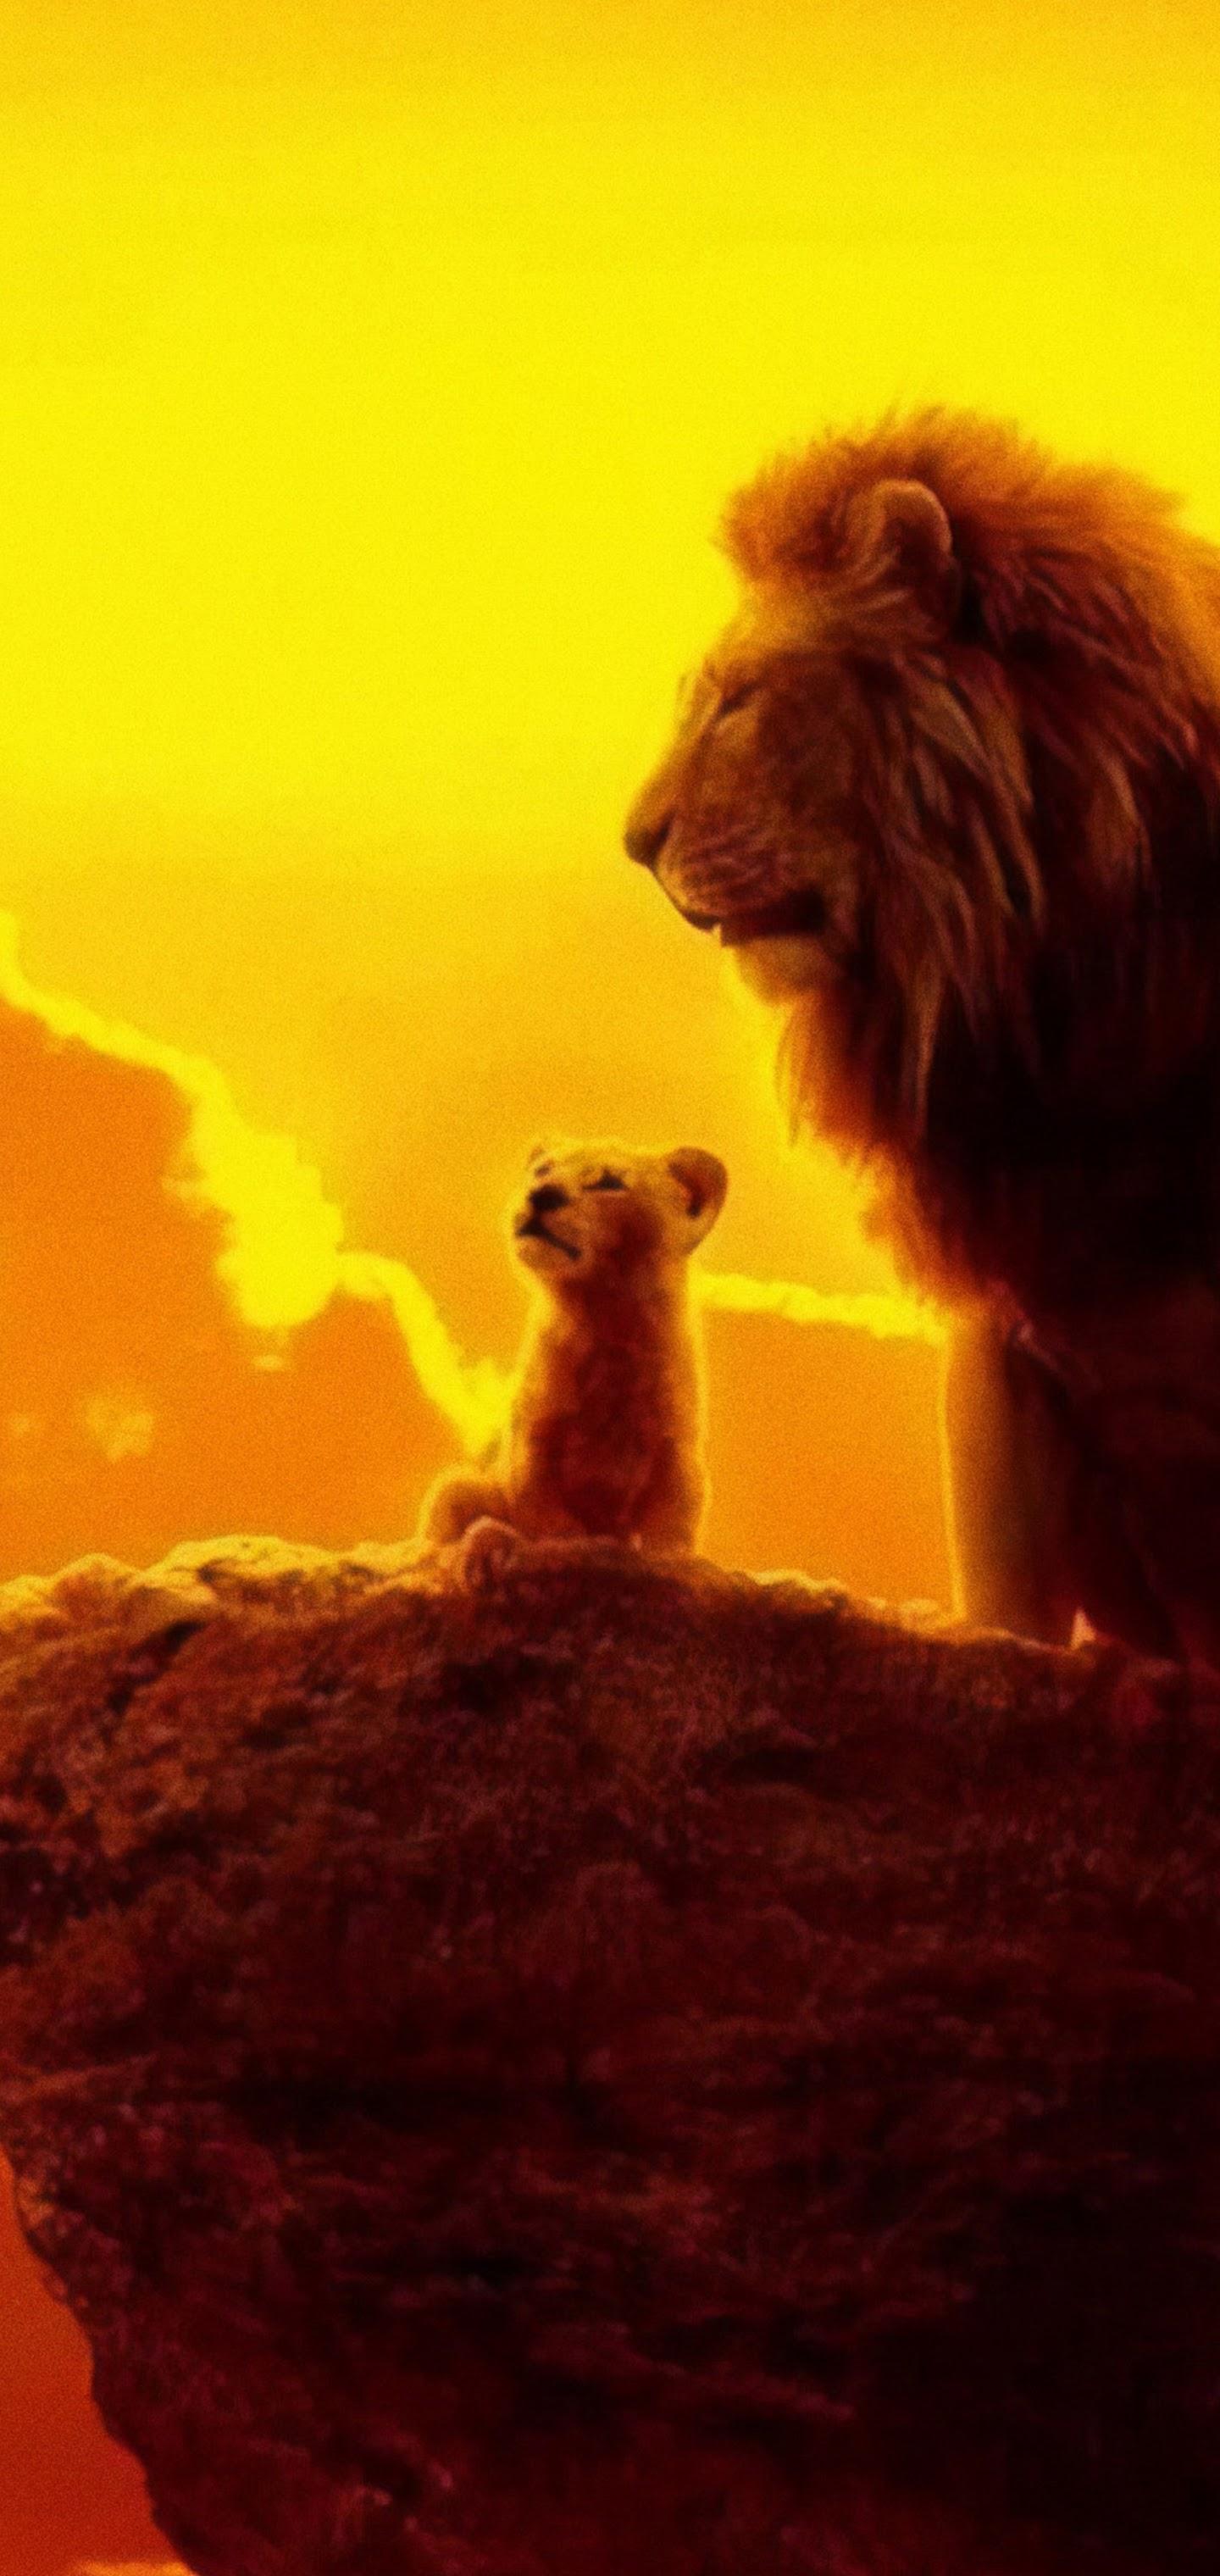 The Lion King 2019 Mufasa Simba 4k Wallpaper 19